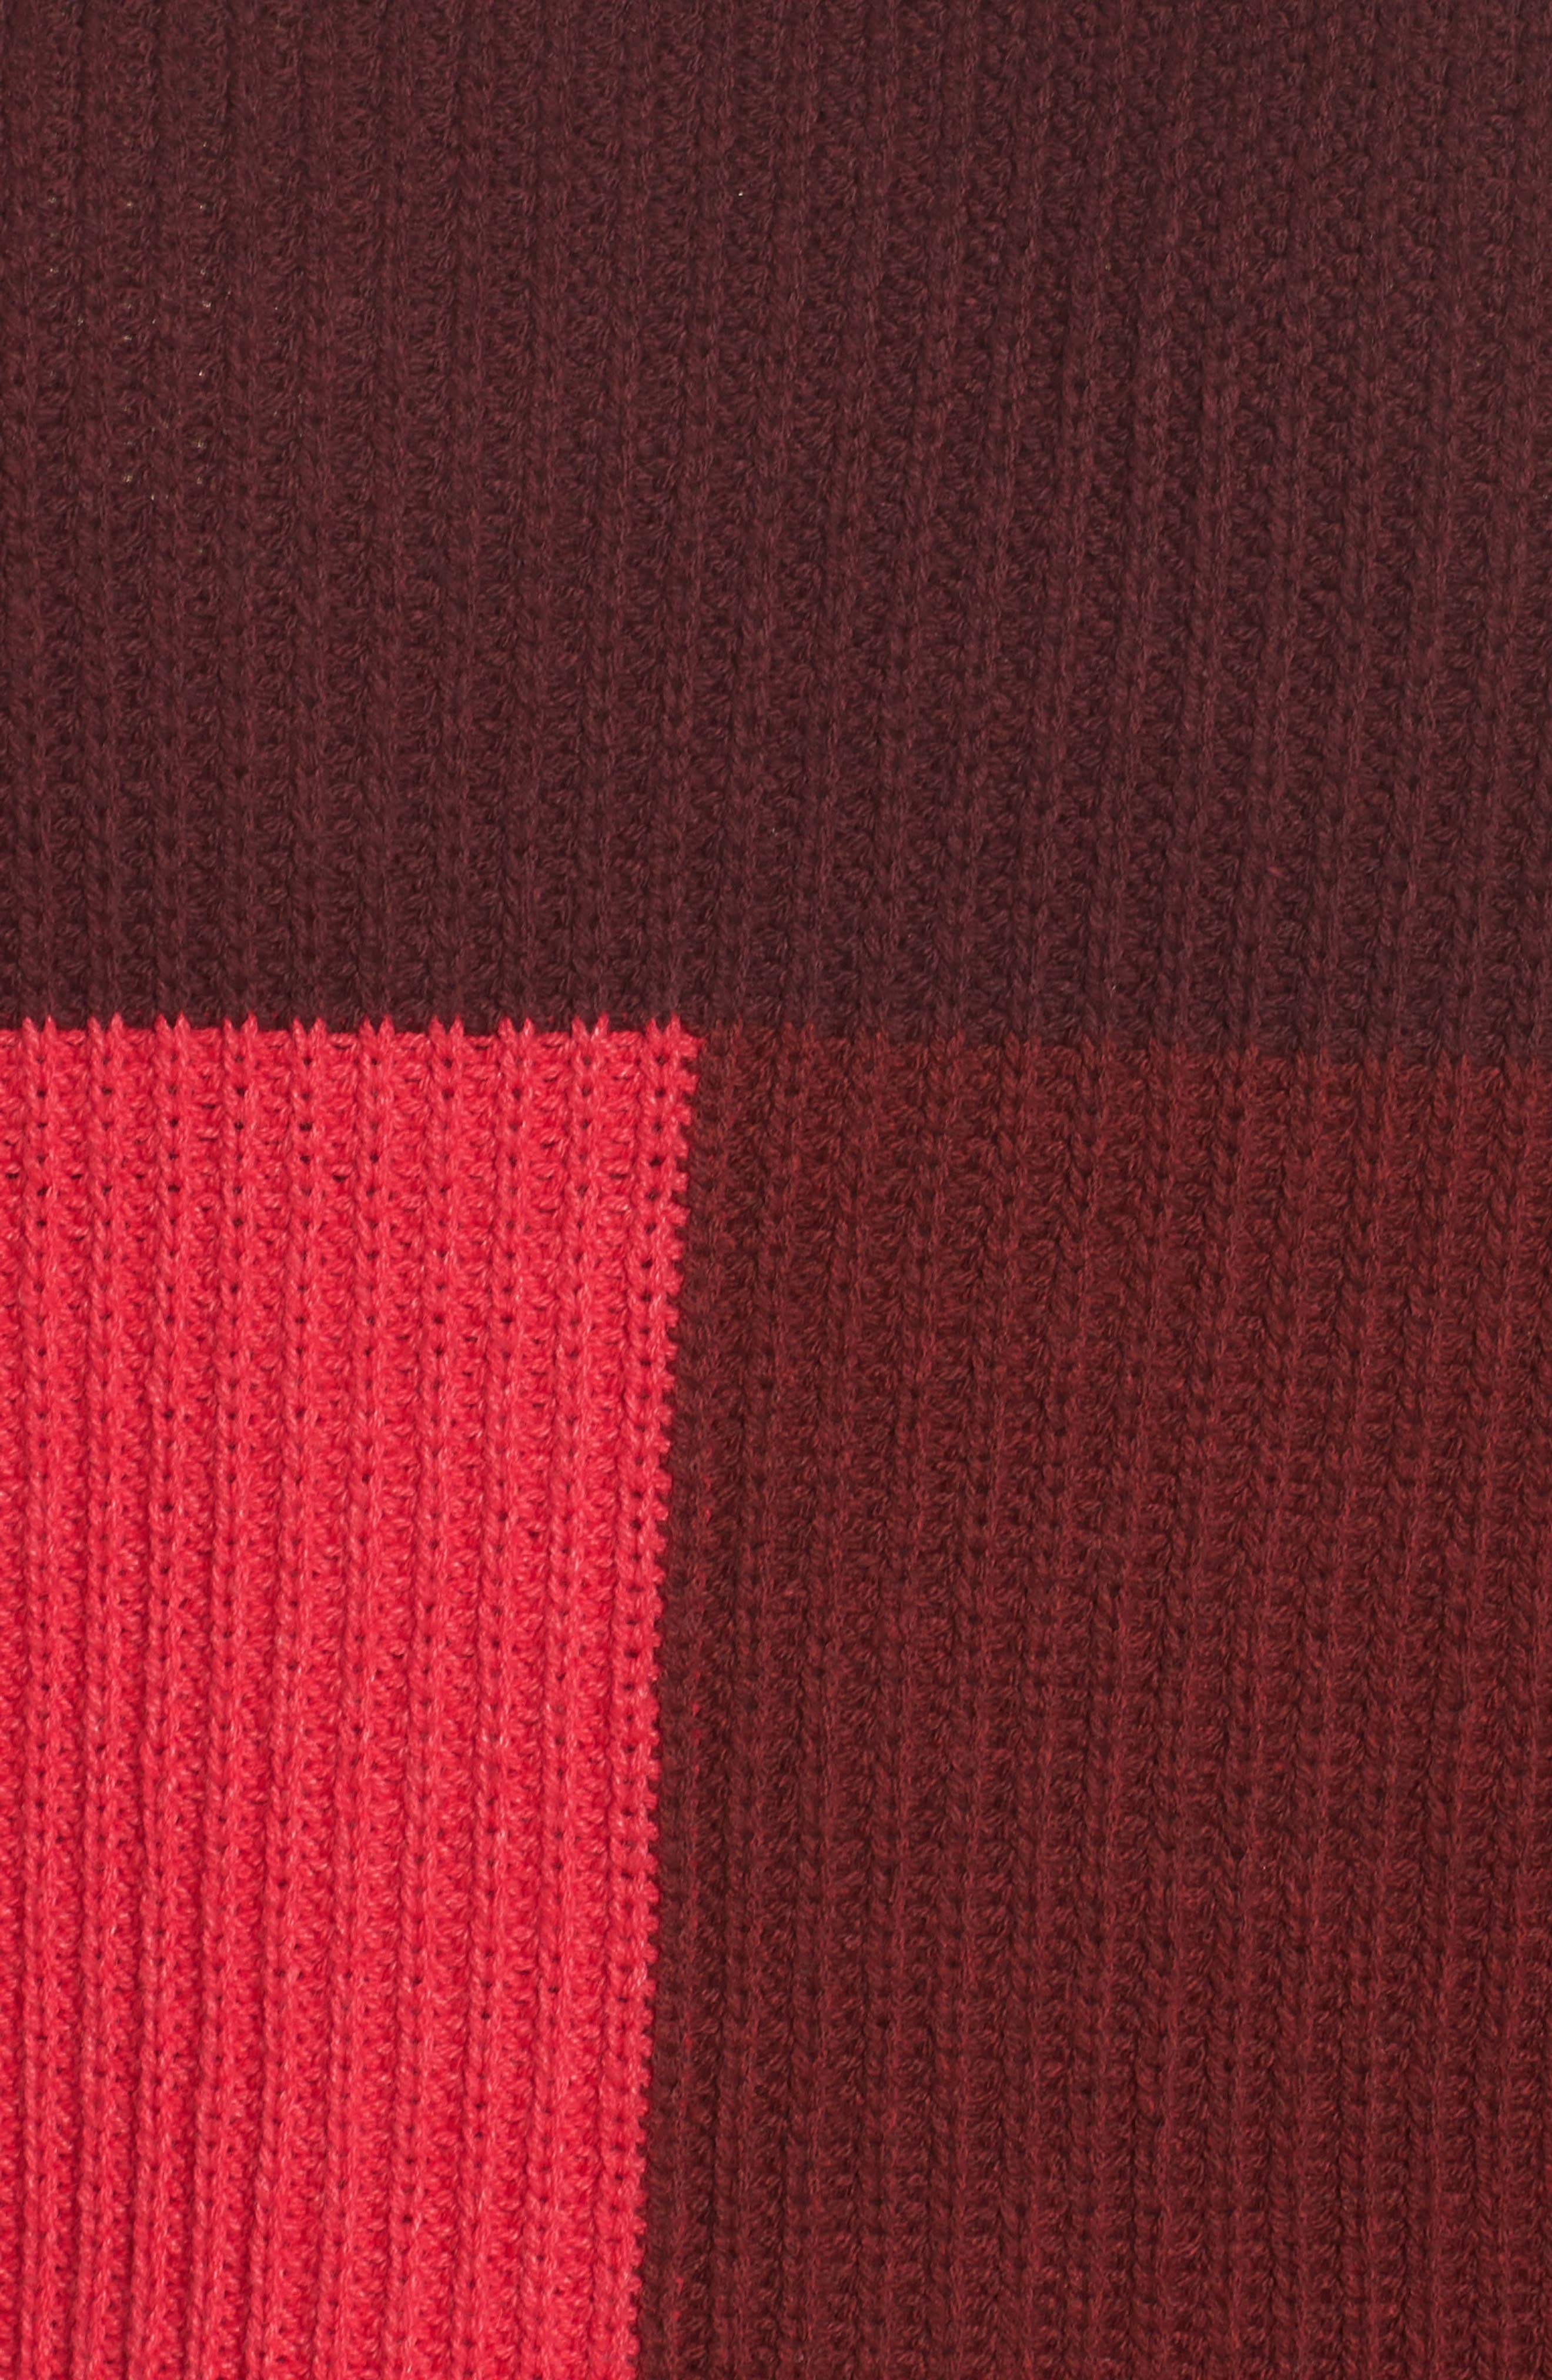 Mock Neck Colorblock Sweater,                             Alternate thumbnail 6, color,                             RED RUMBA COLORBLOCK